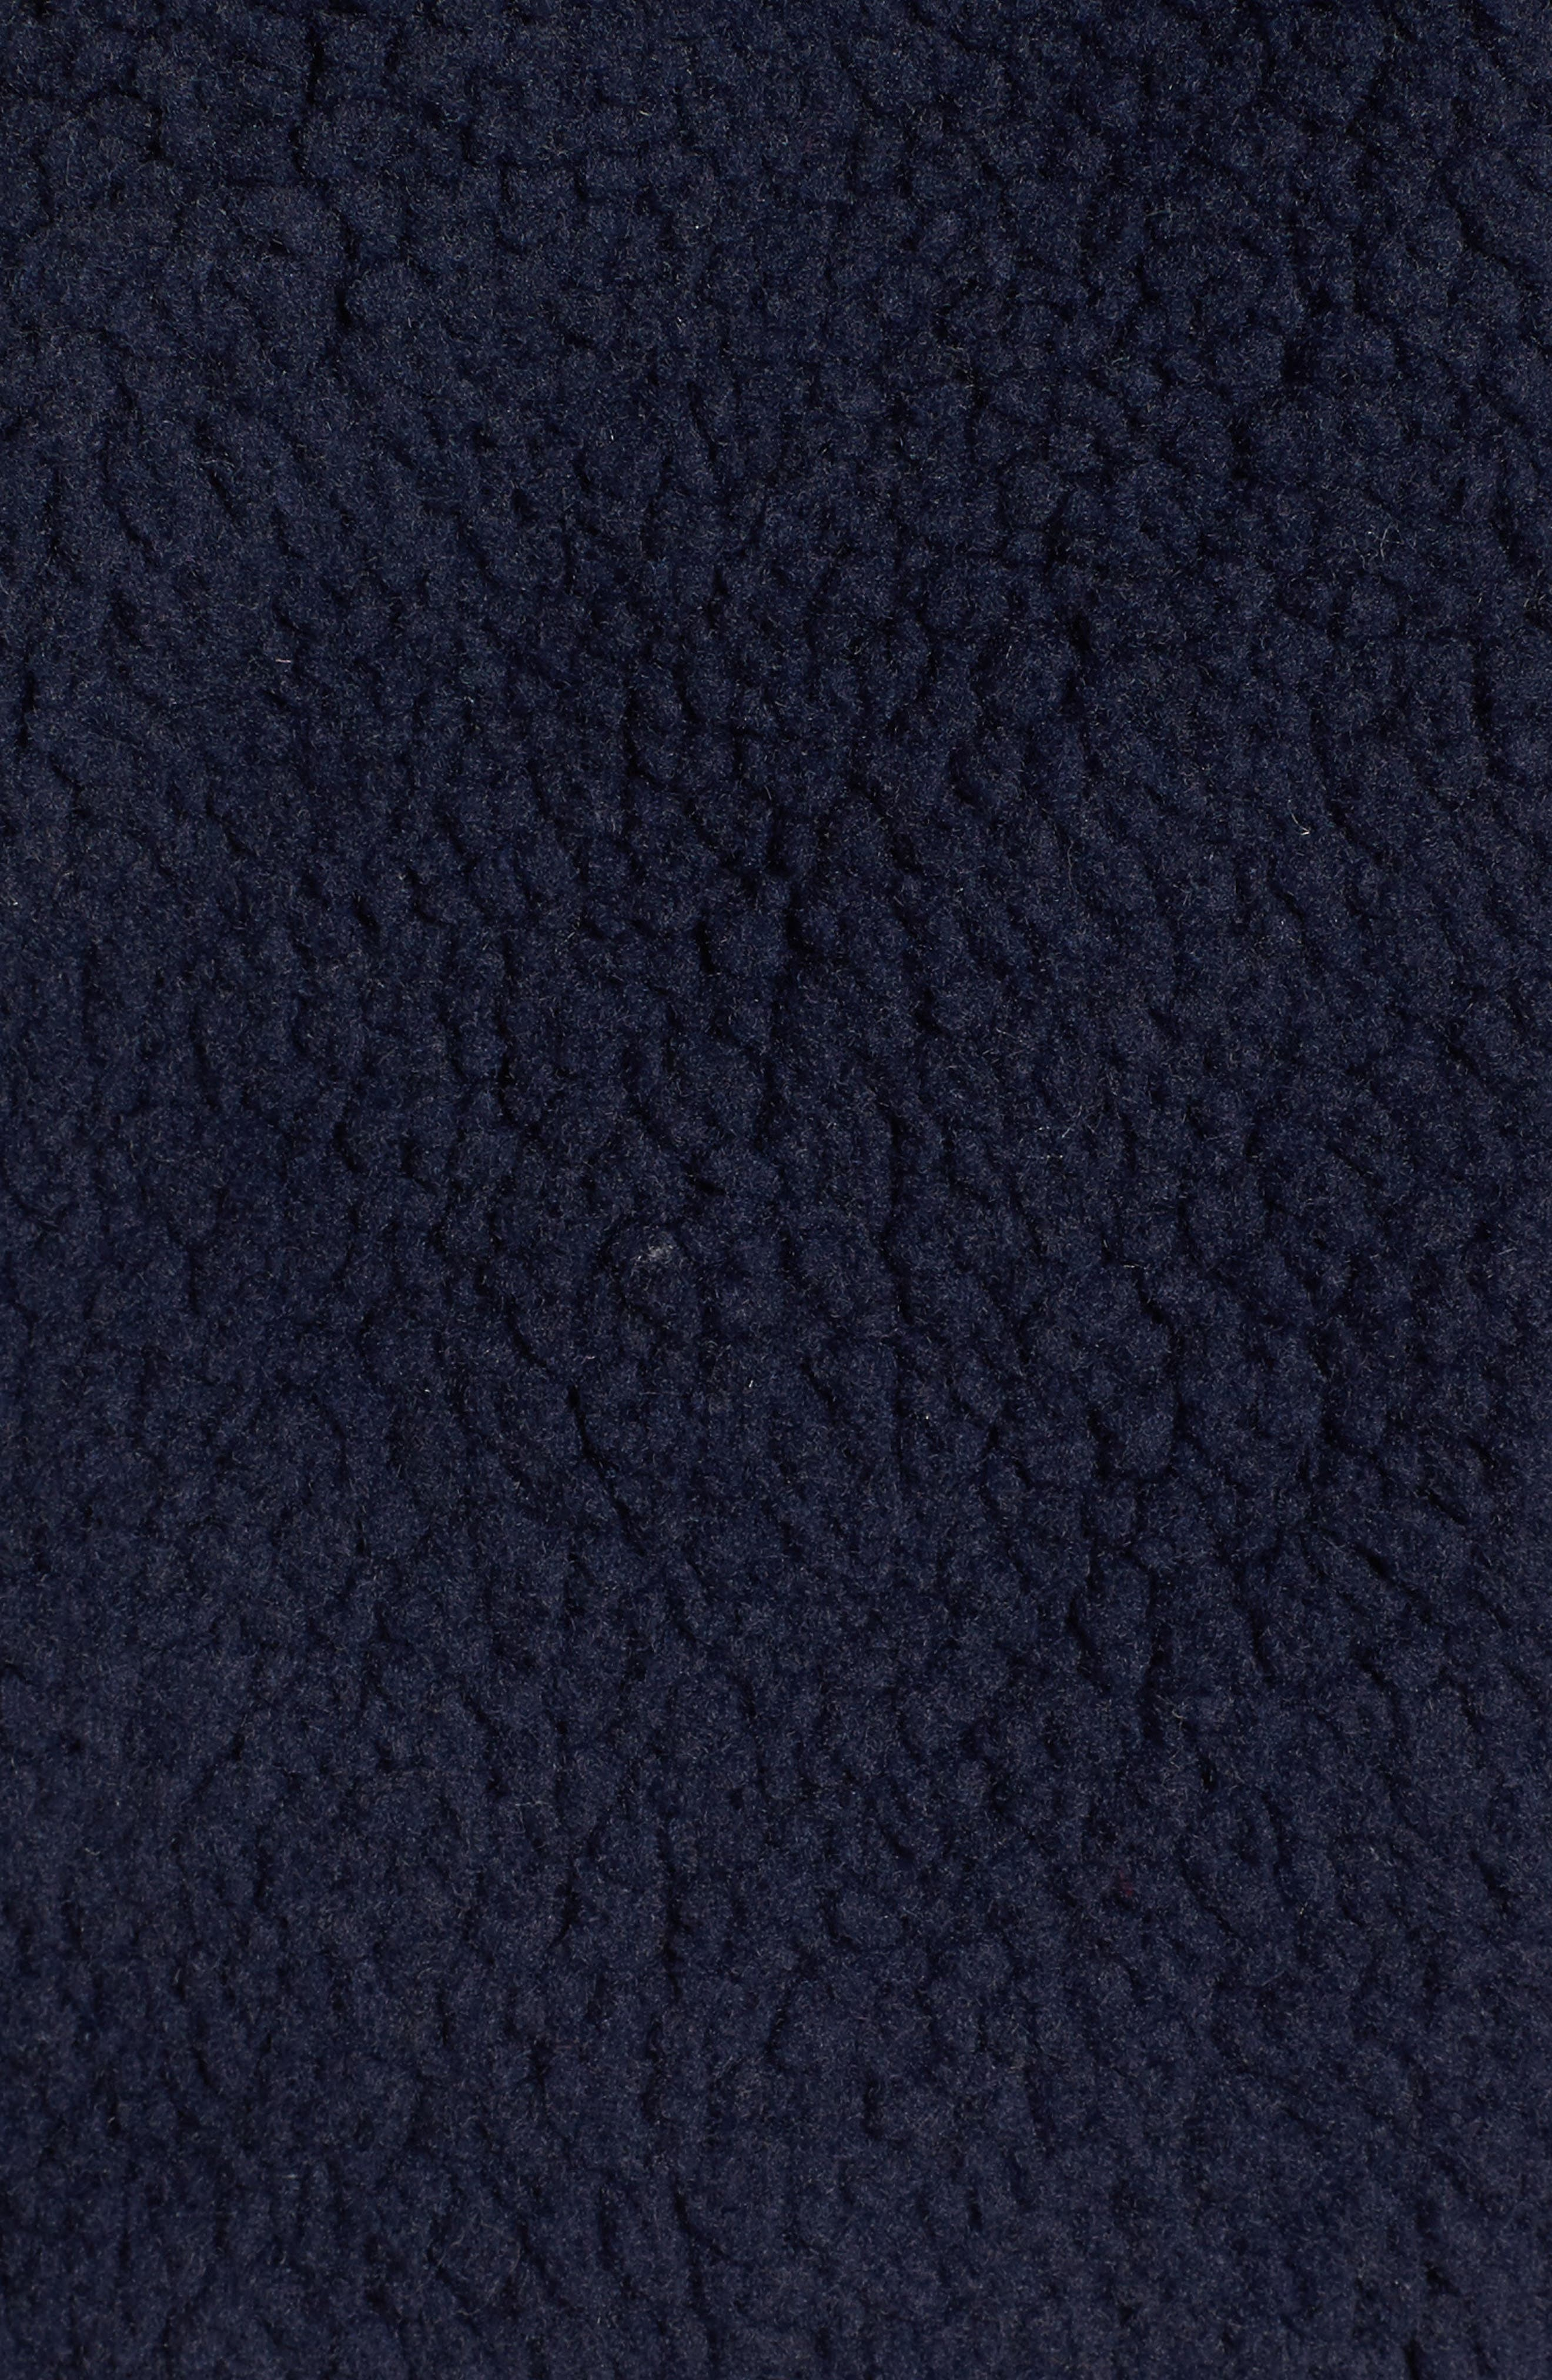 Mattawa Fleece Jacket,                             Alternate thumbnail 5, color,                             Navy